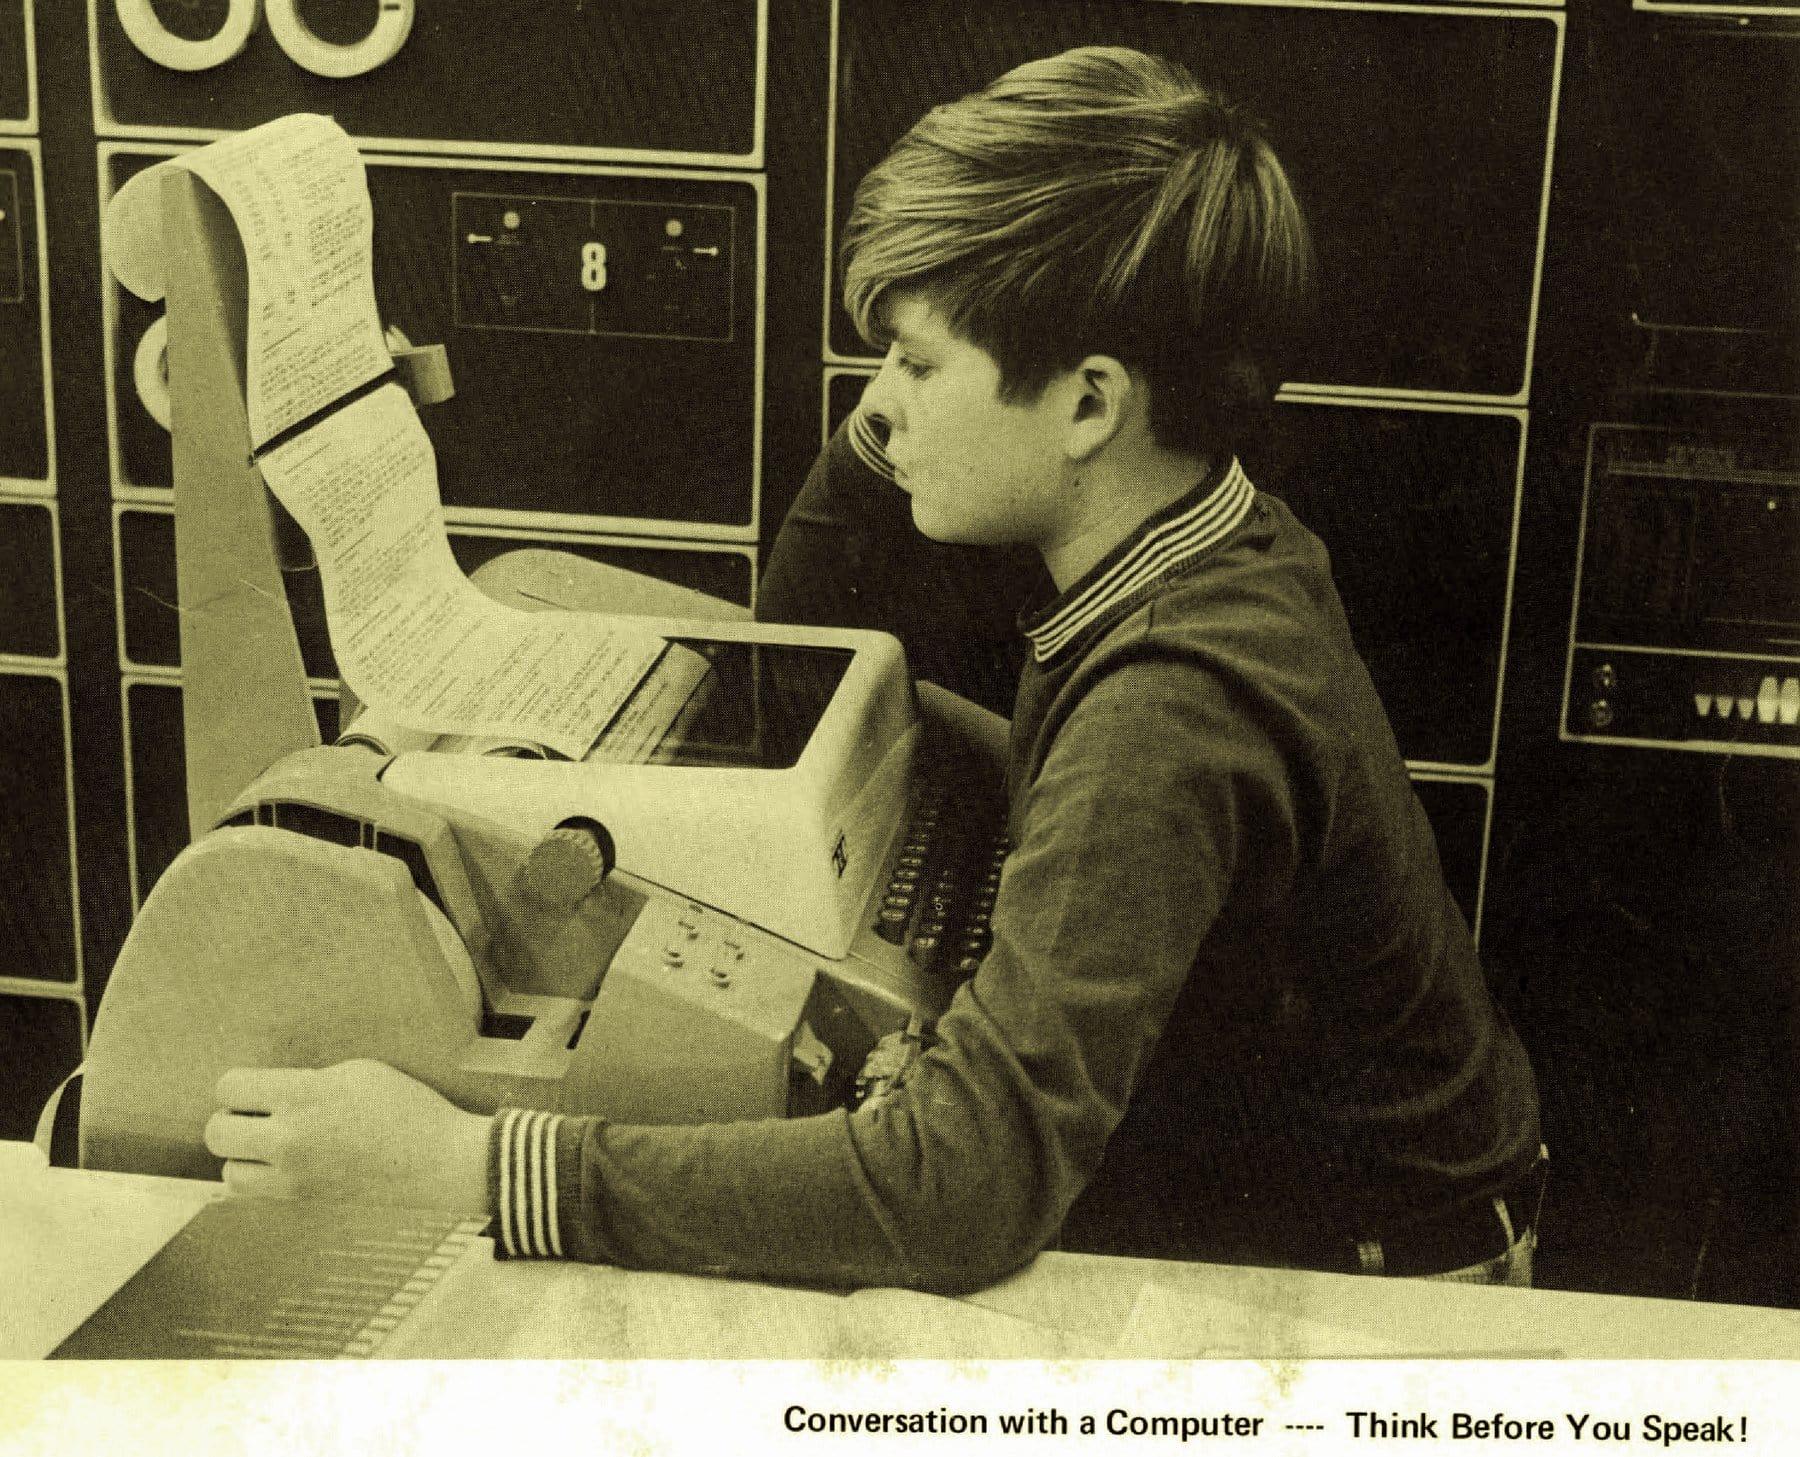 Boy reading computer printouts (1971)